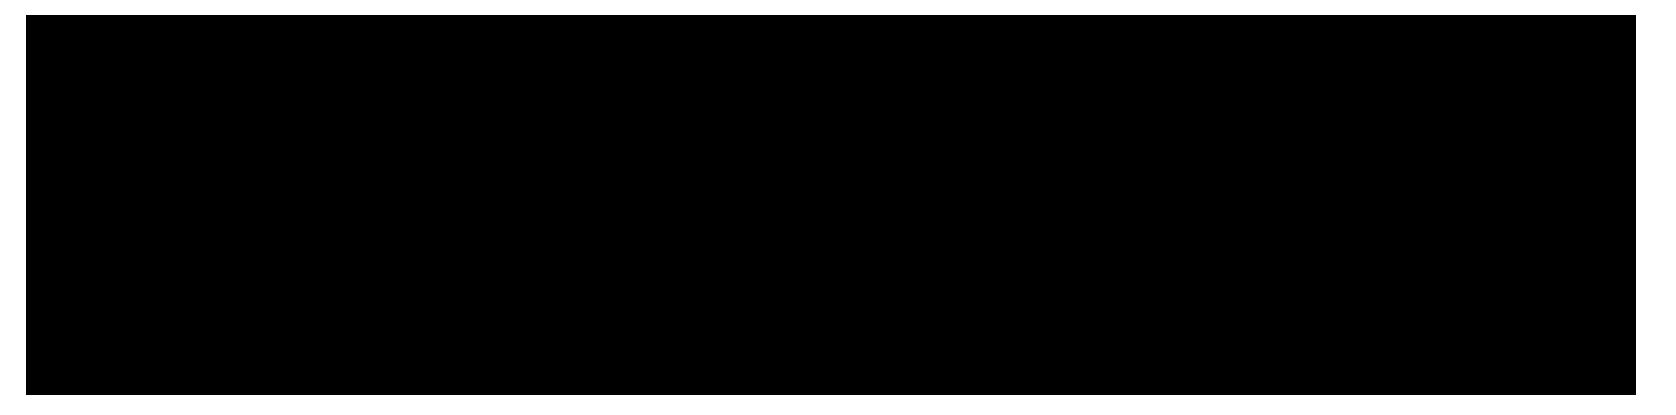 Sameside-Logo-Black